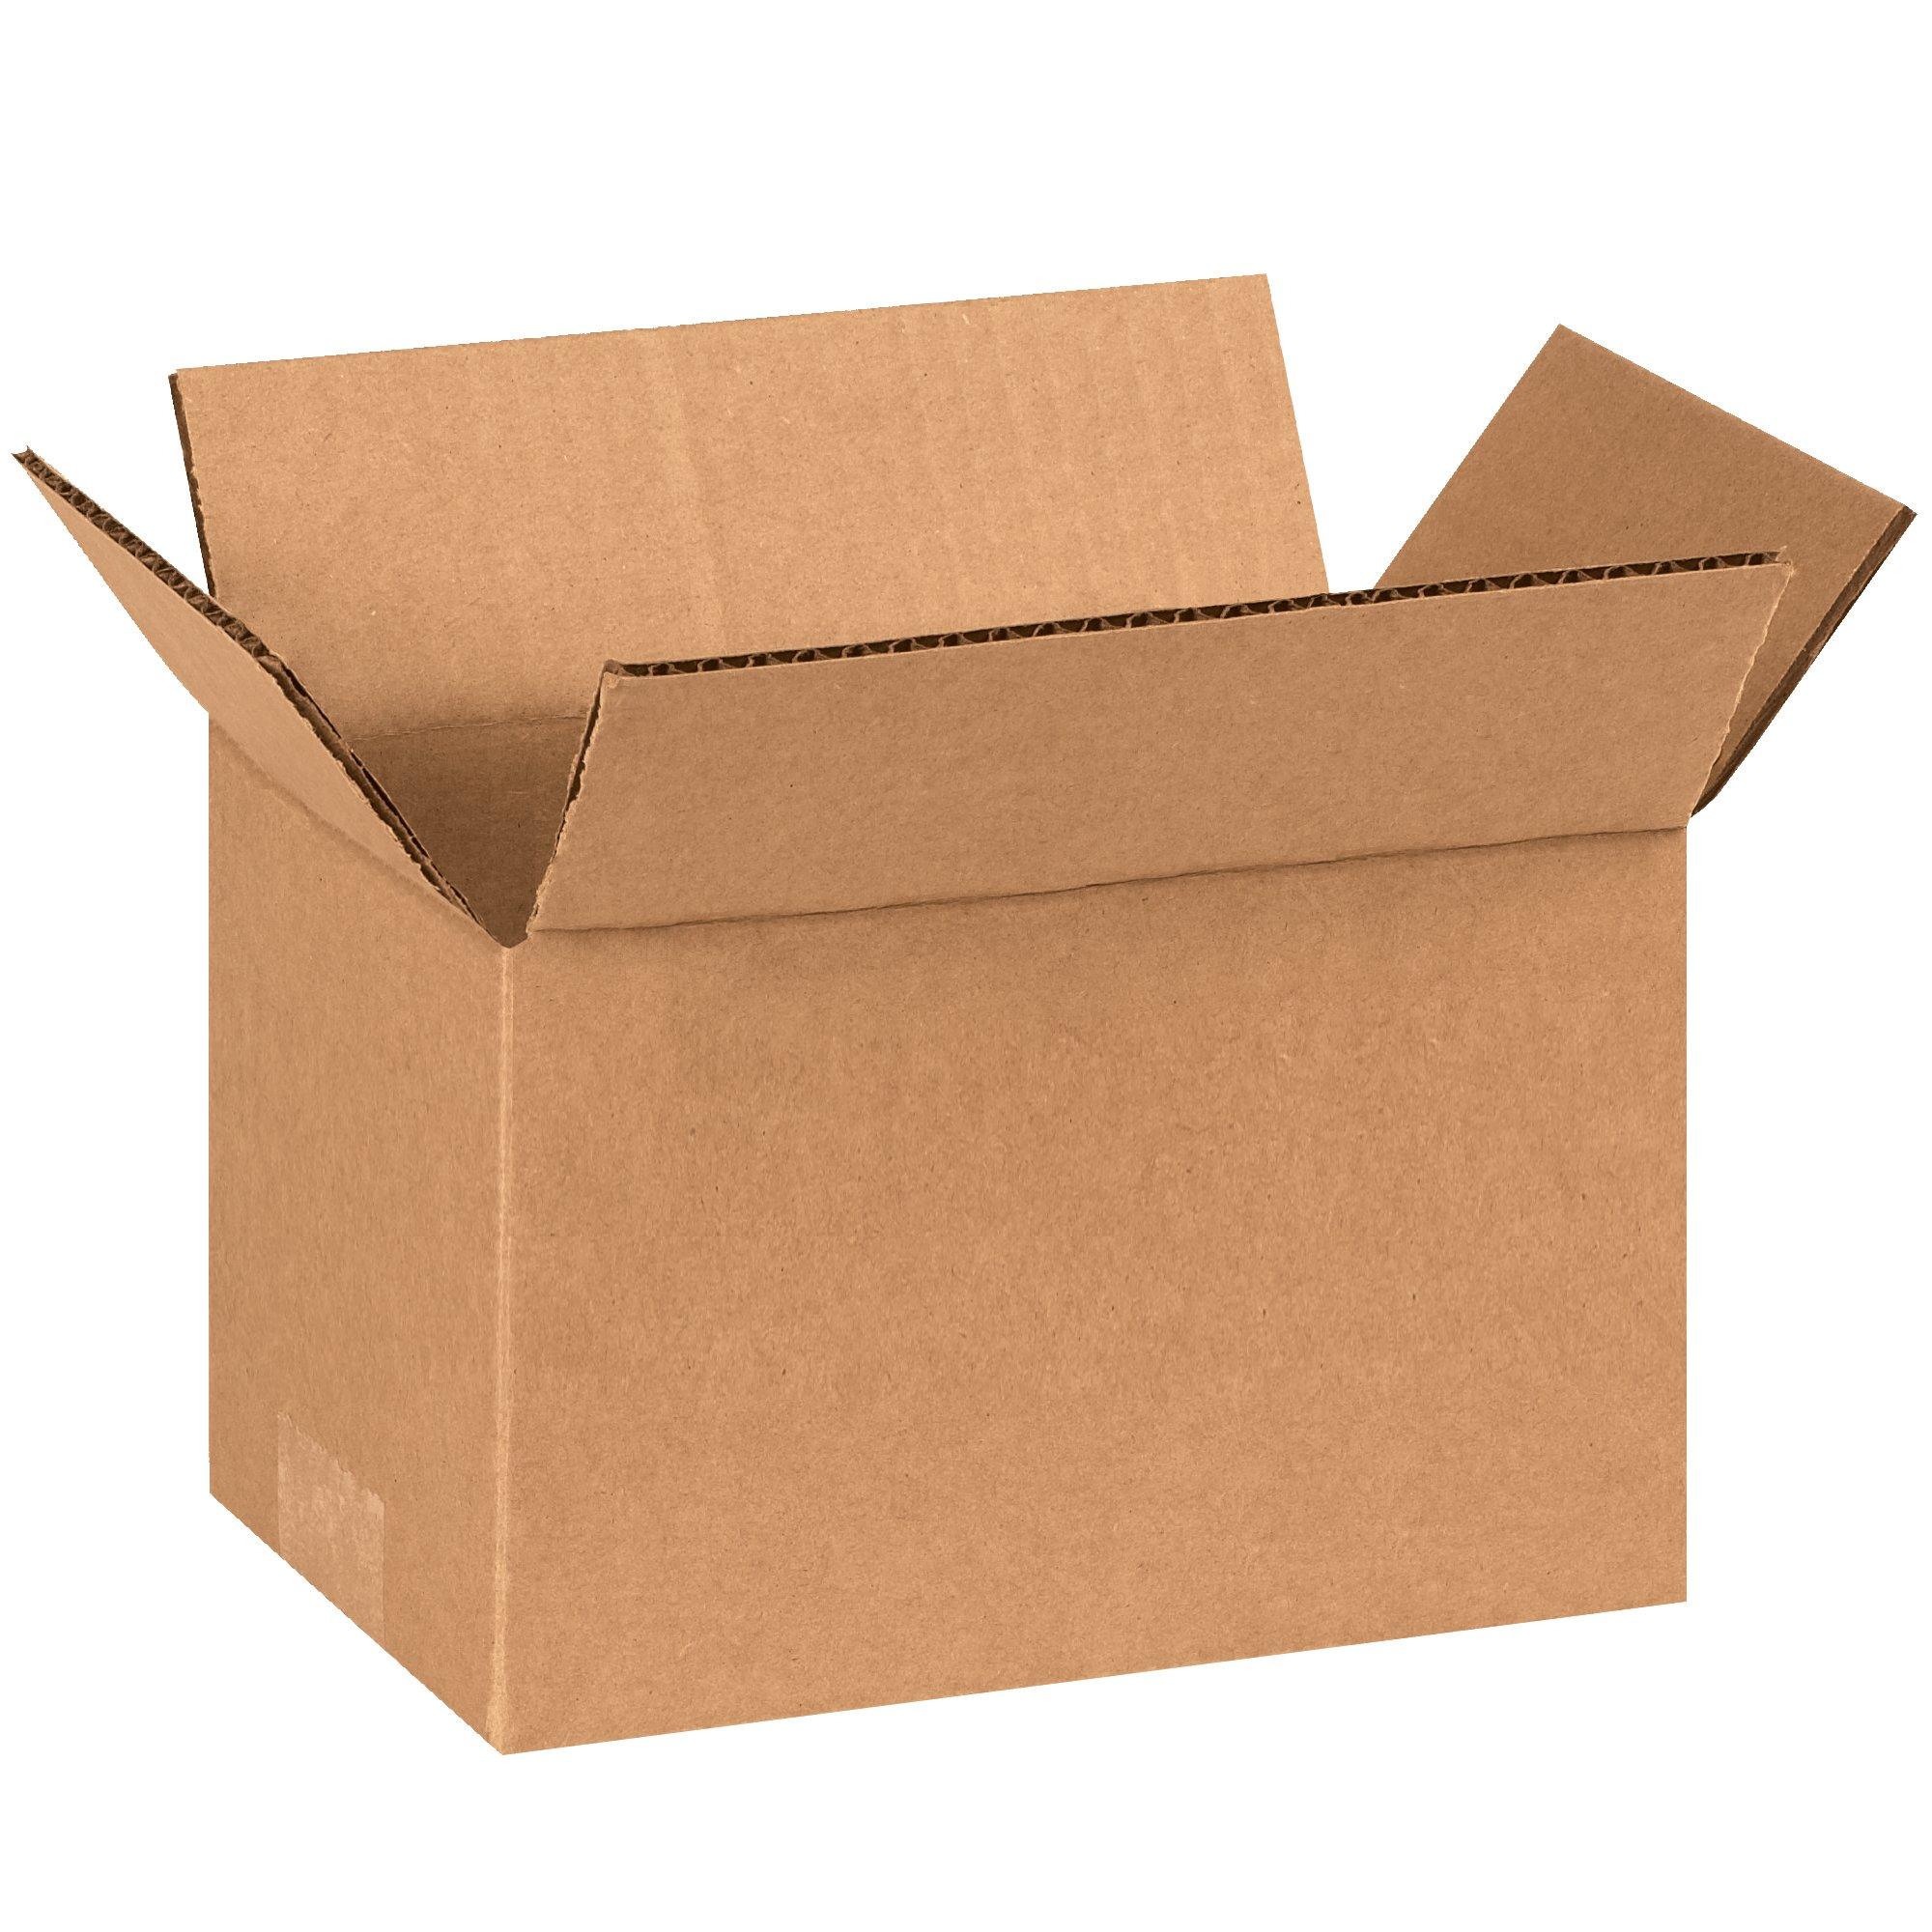 BOX USA B8542000PK Corrugated Boxes, 8''L x 5''W x 4''H, Kraft (Pack of 2000)